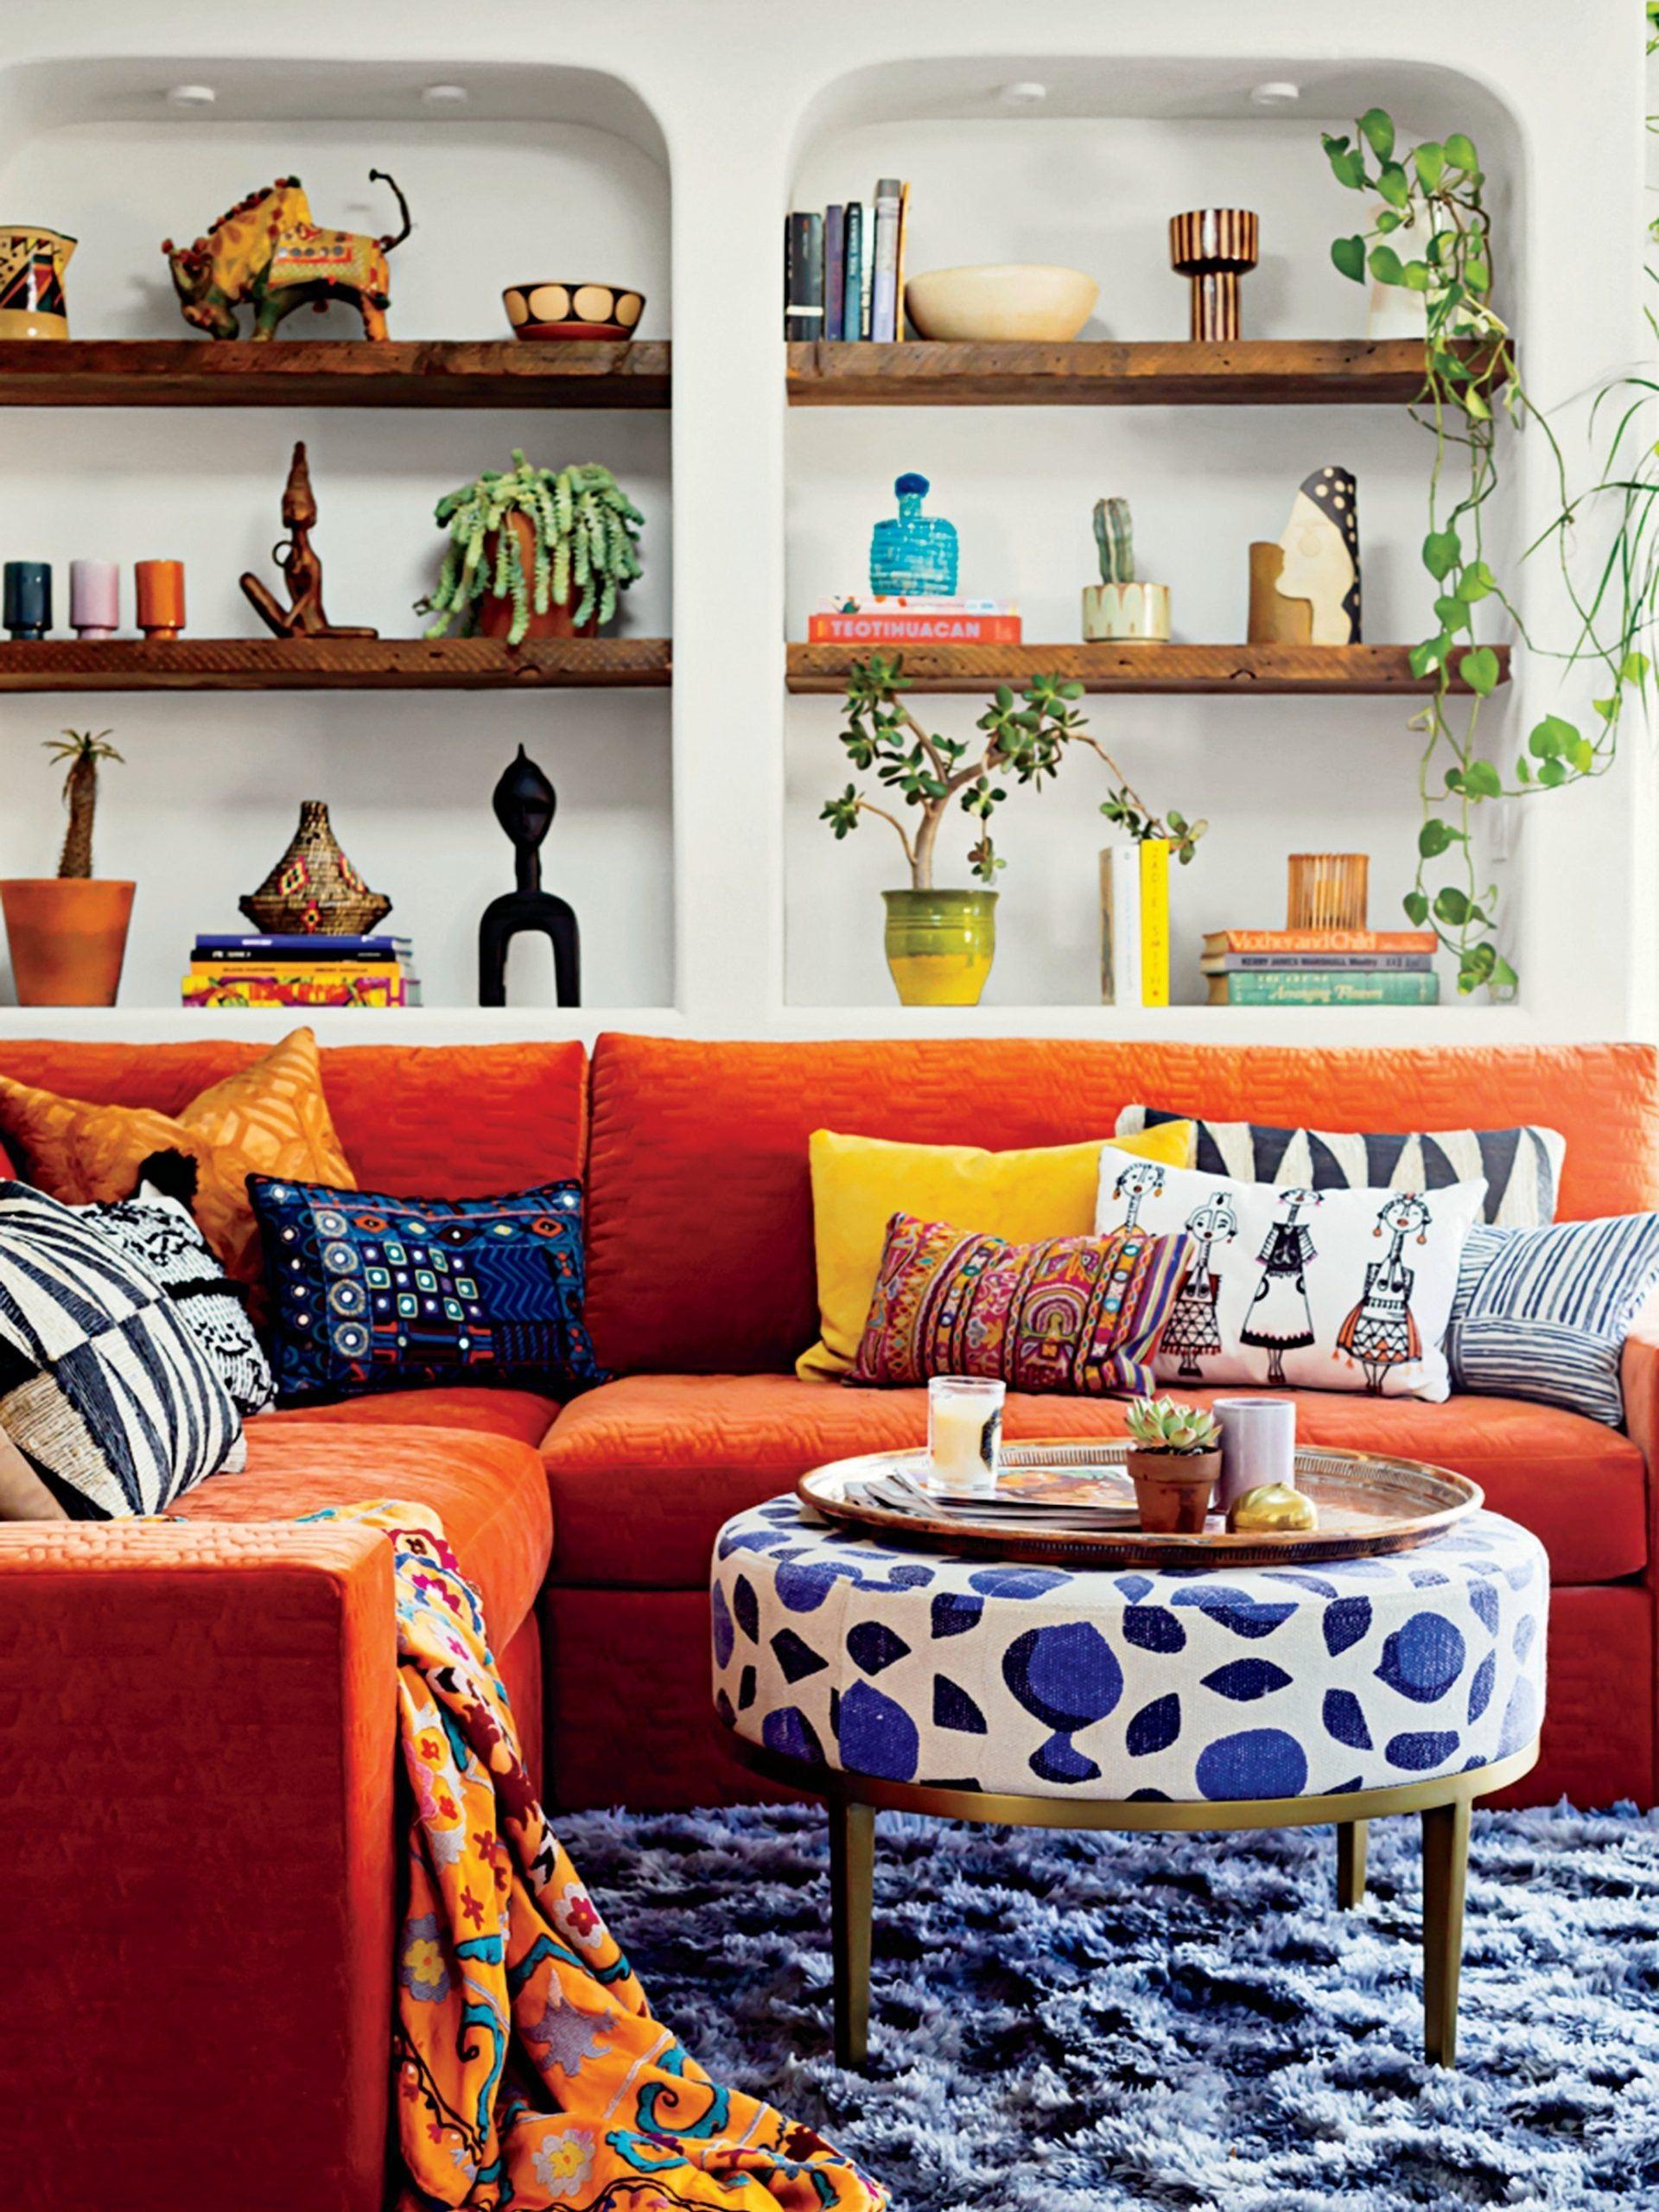 Interior Designer Justina Blakeney Shows The World How To ...